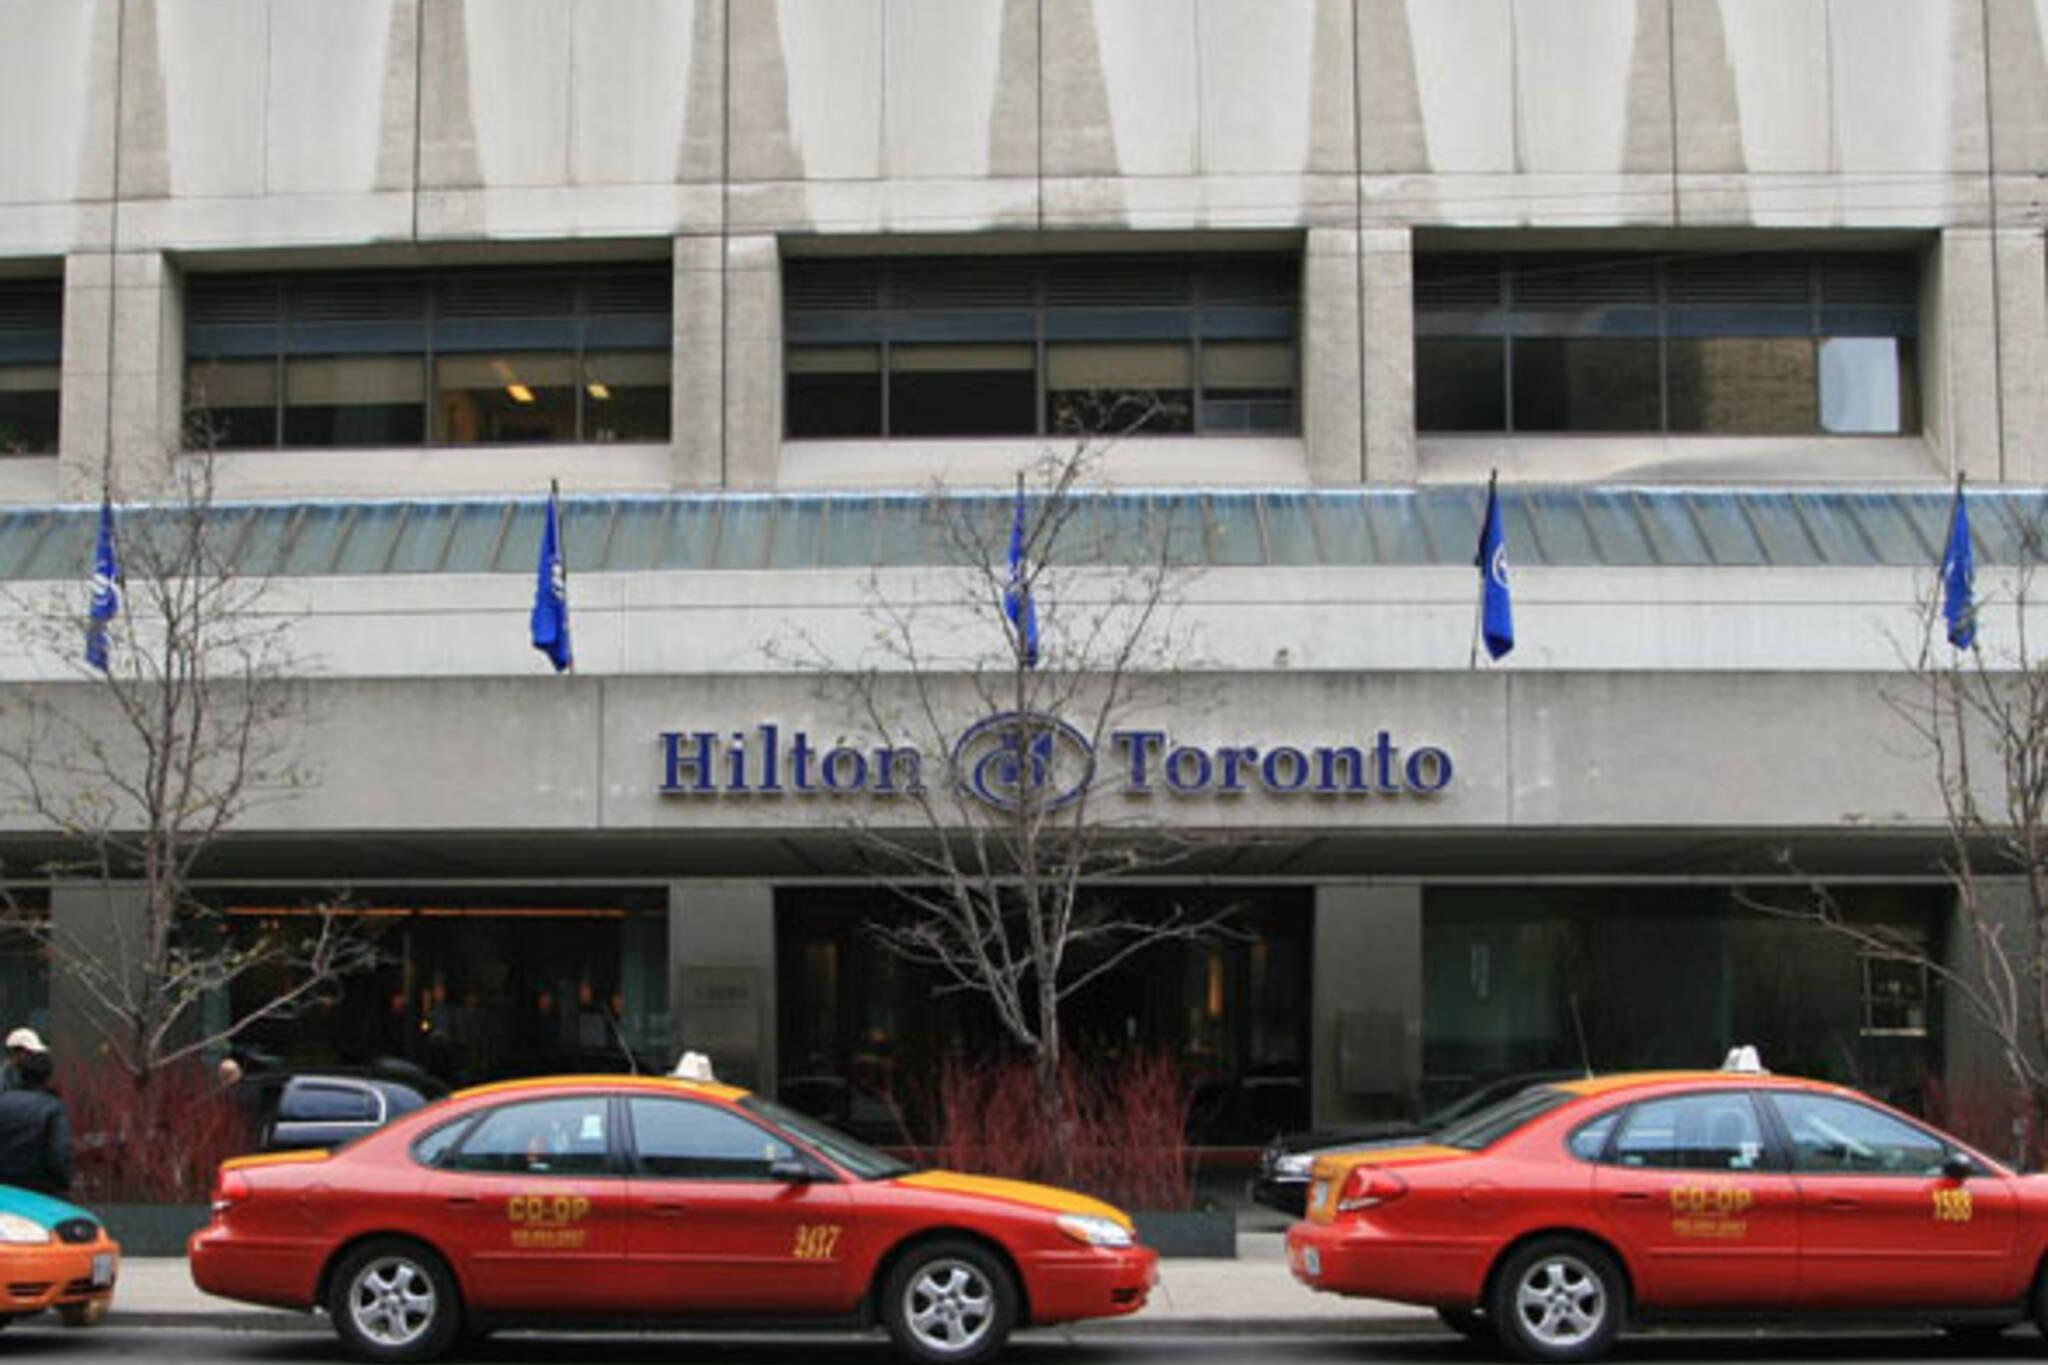 Hilton Hotel Toronto